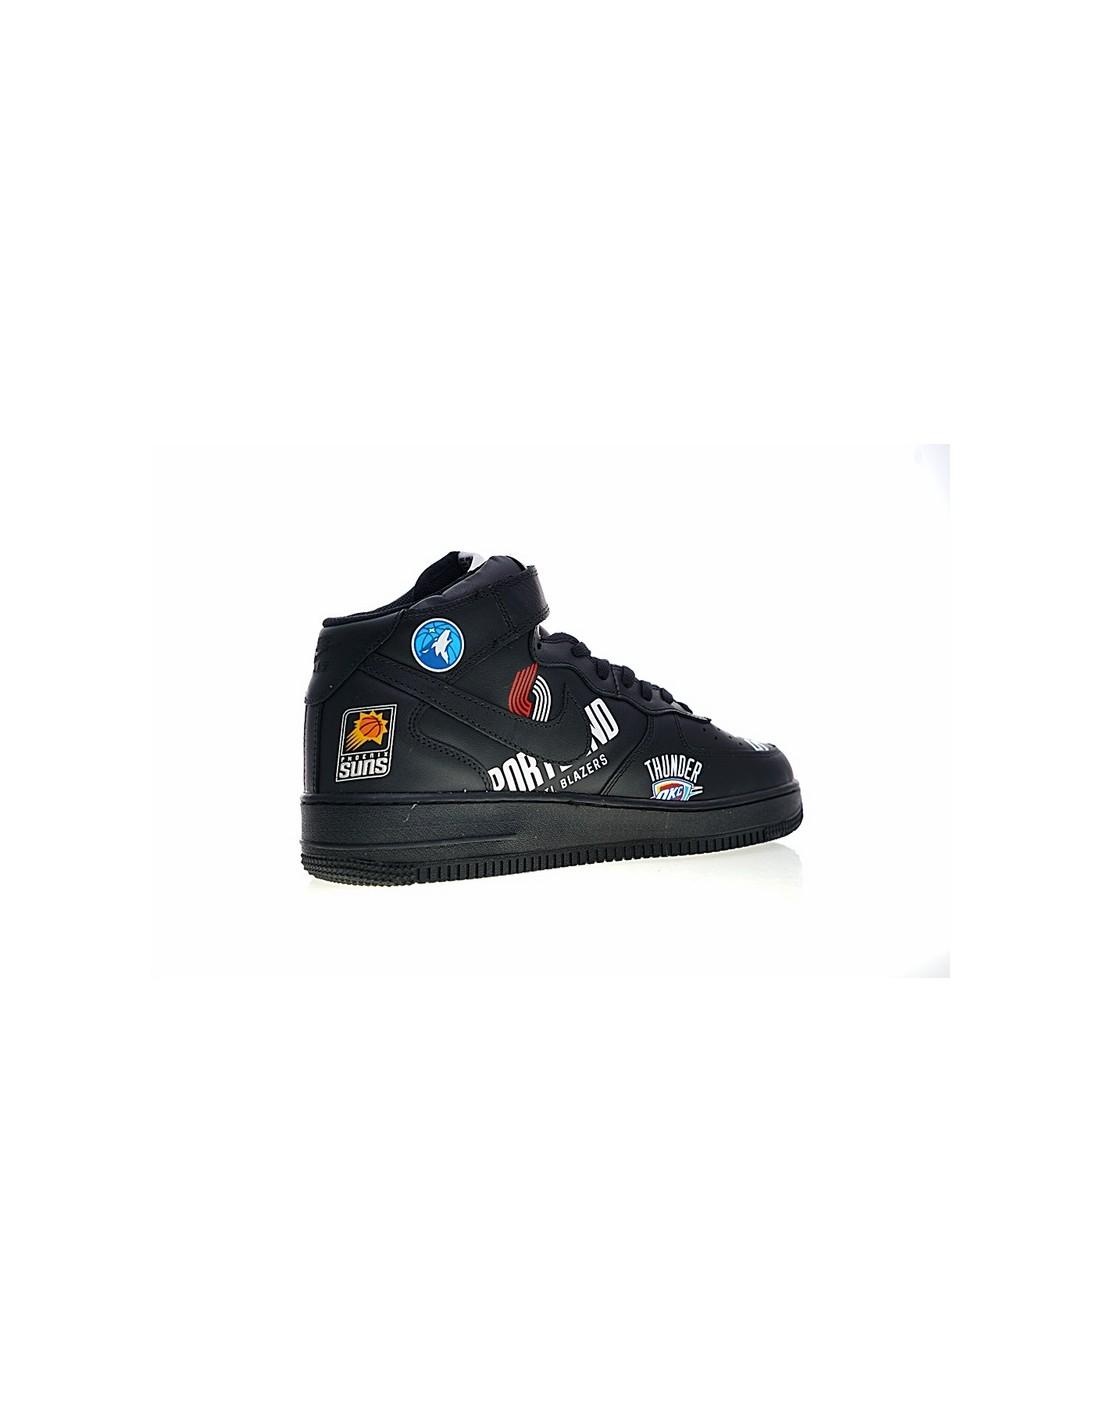 Air Force 1 AF1 Mid x Supreme x NBA